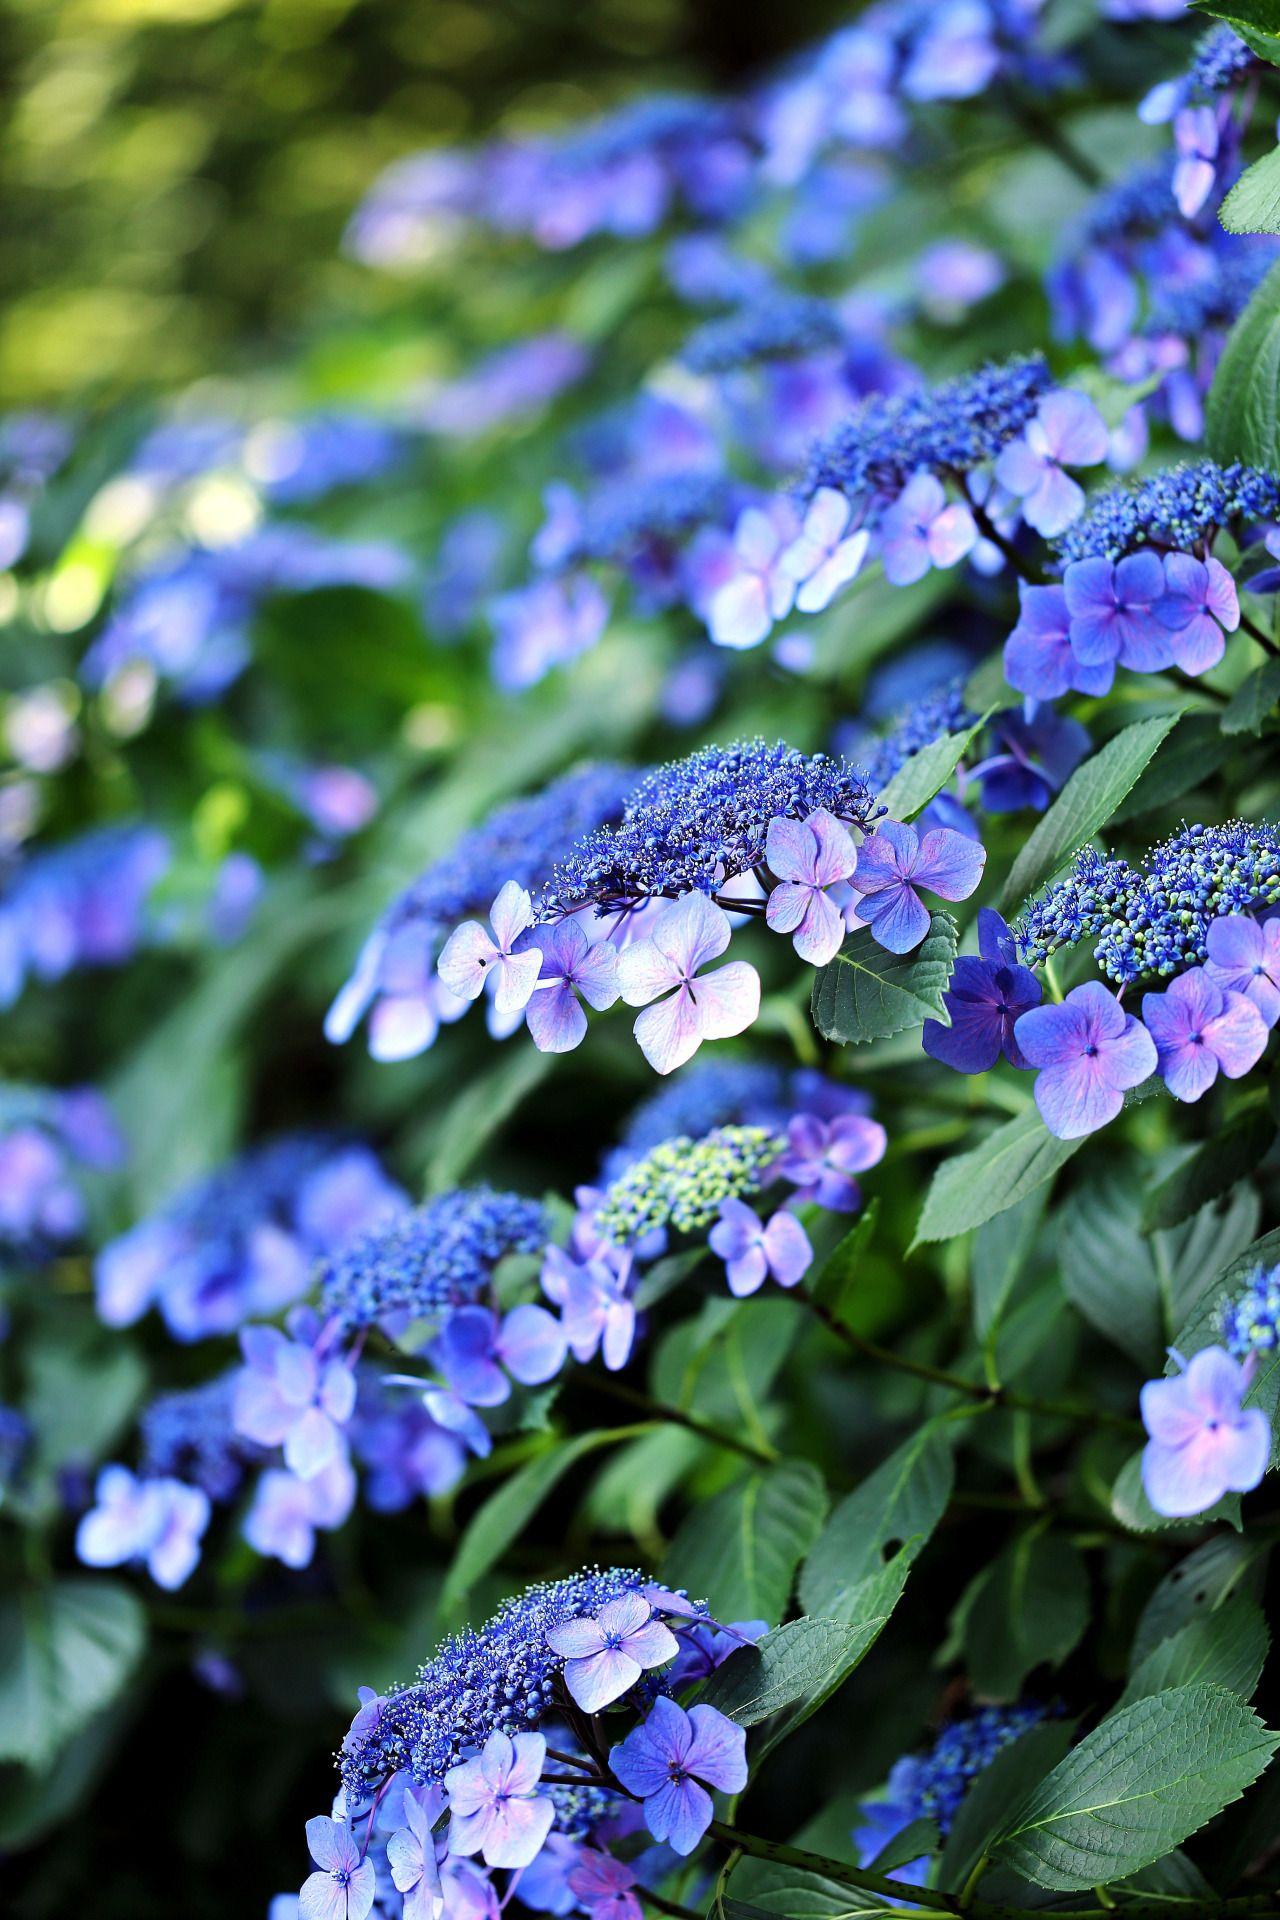 Hydrangea Beautiful hydrangeas, Hydrangea garden